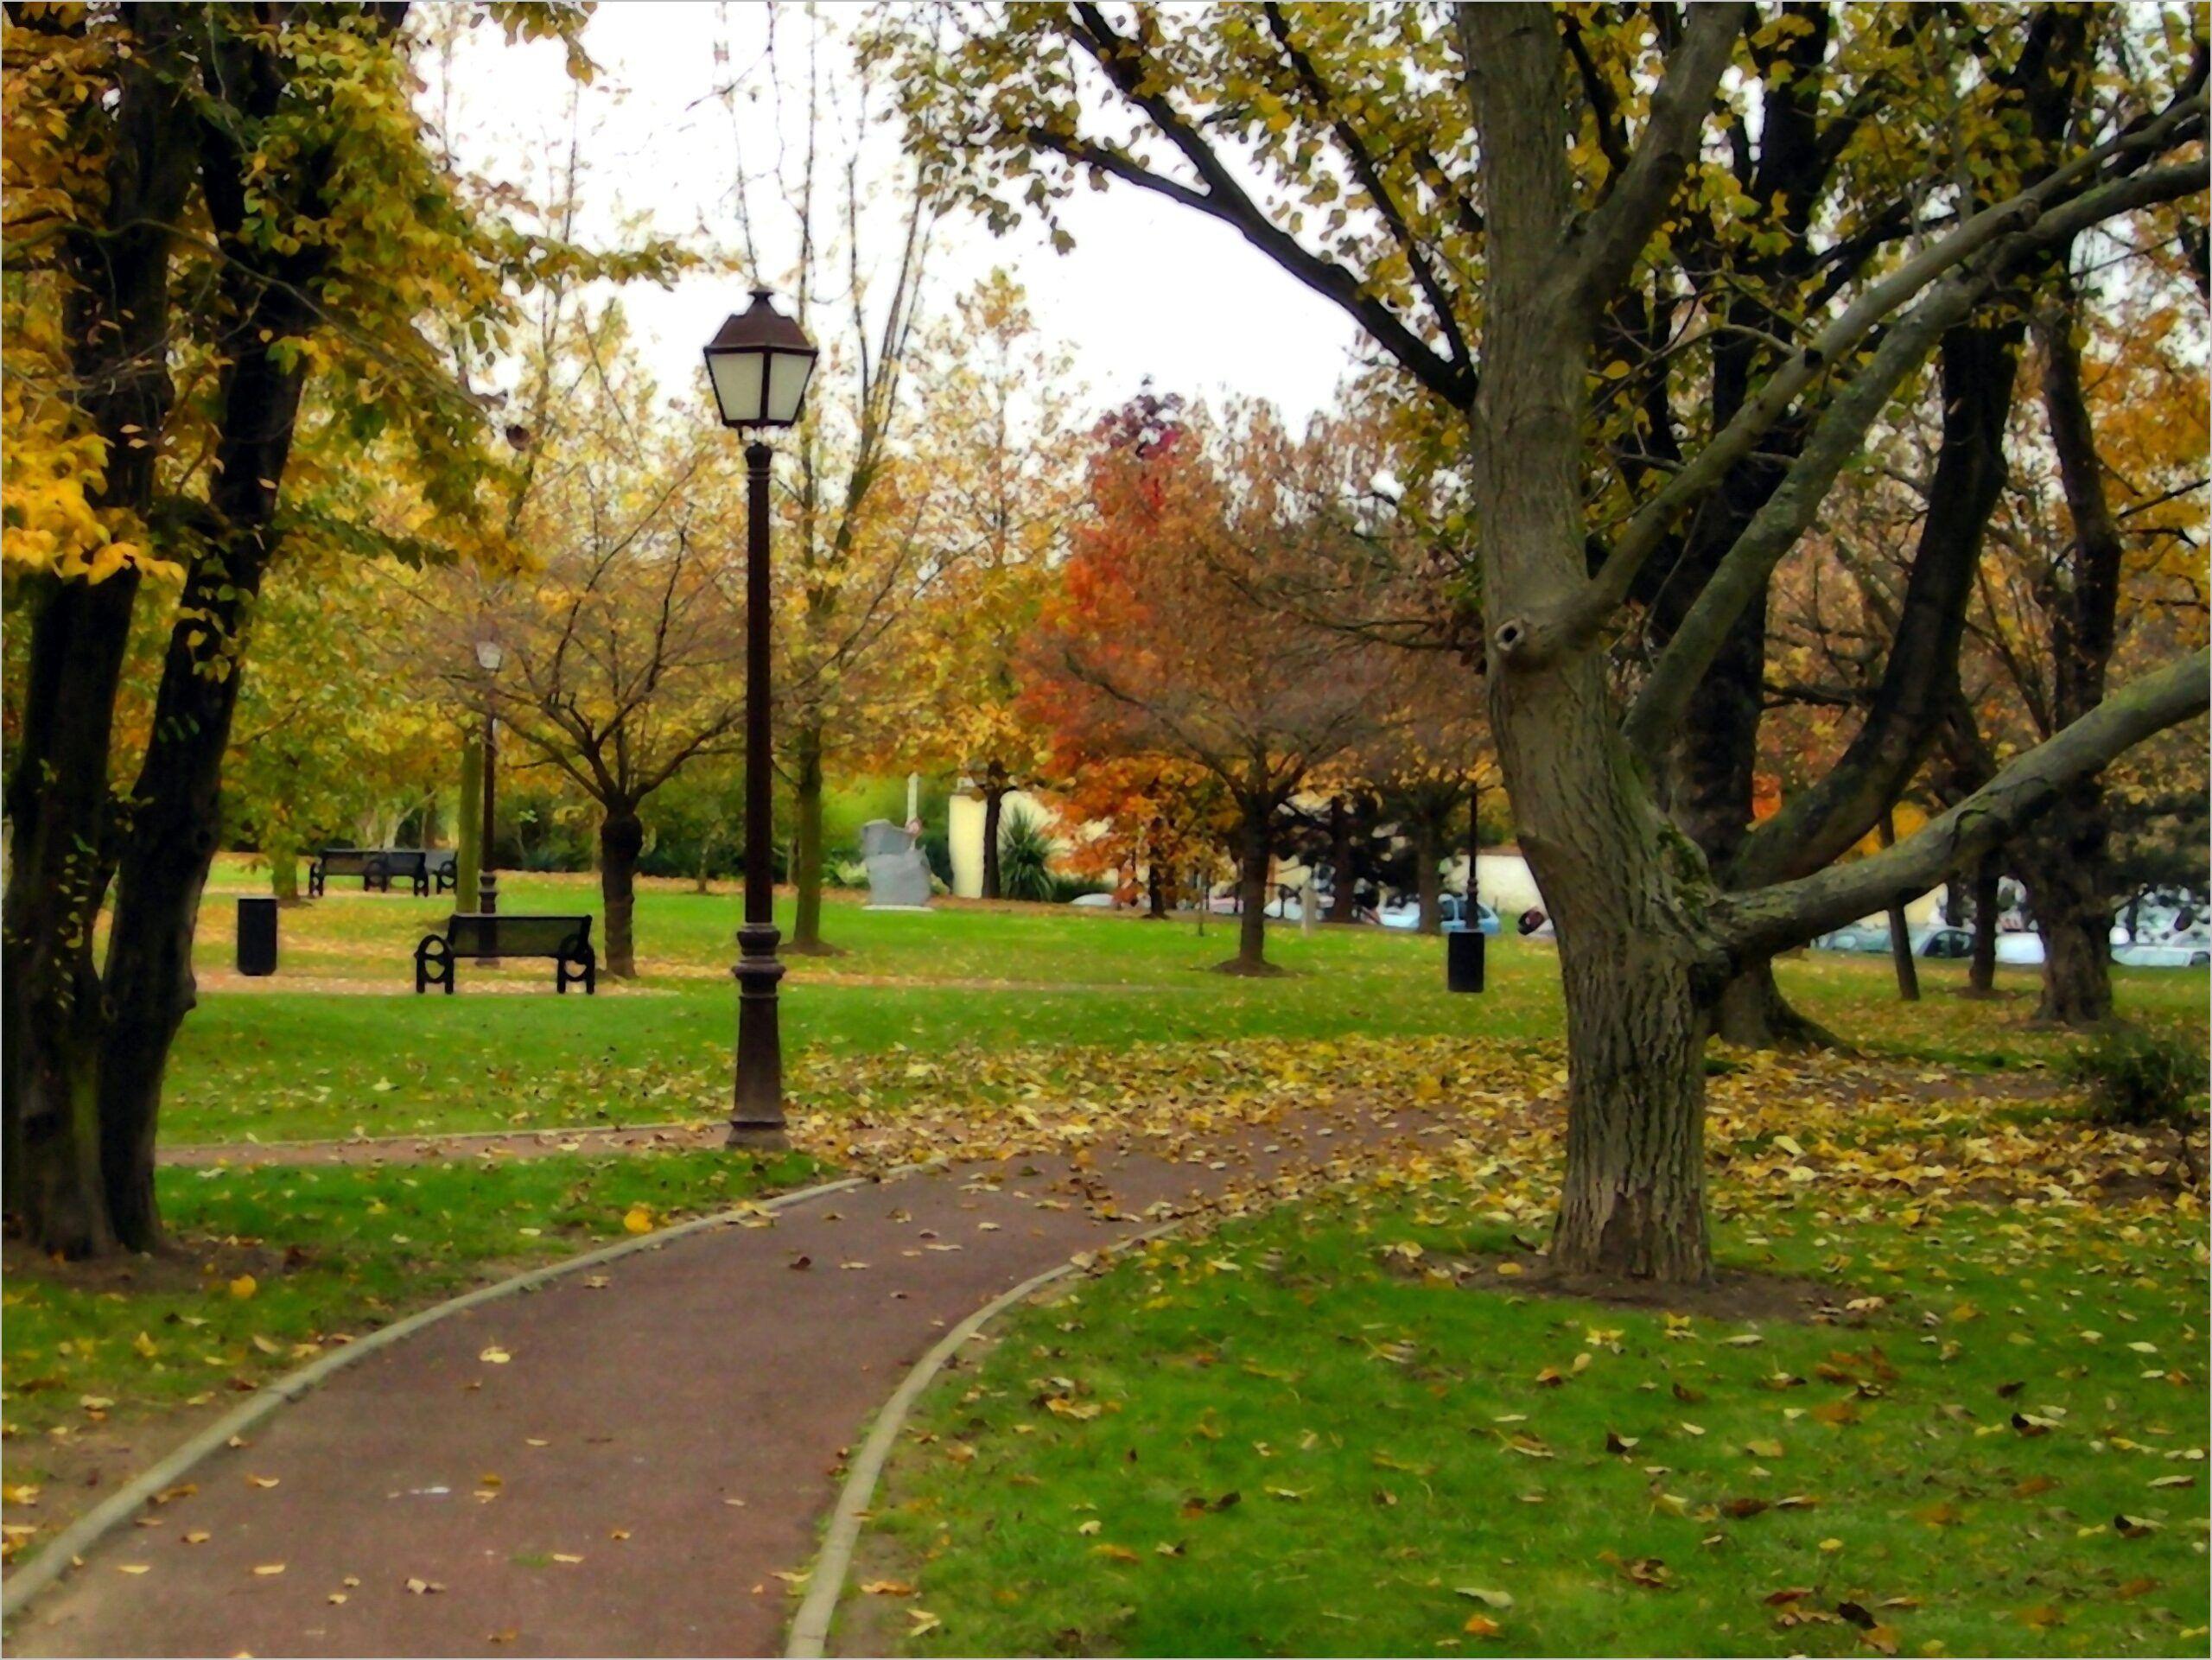 Autumn in hyde park wallpaper 4k in 2020 hyde park